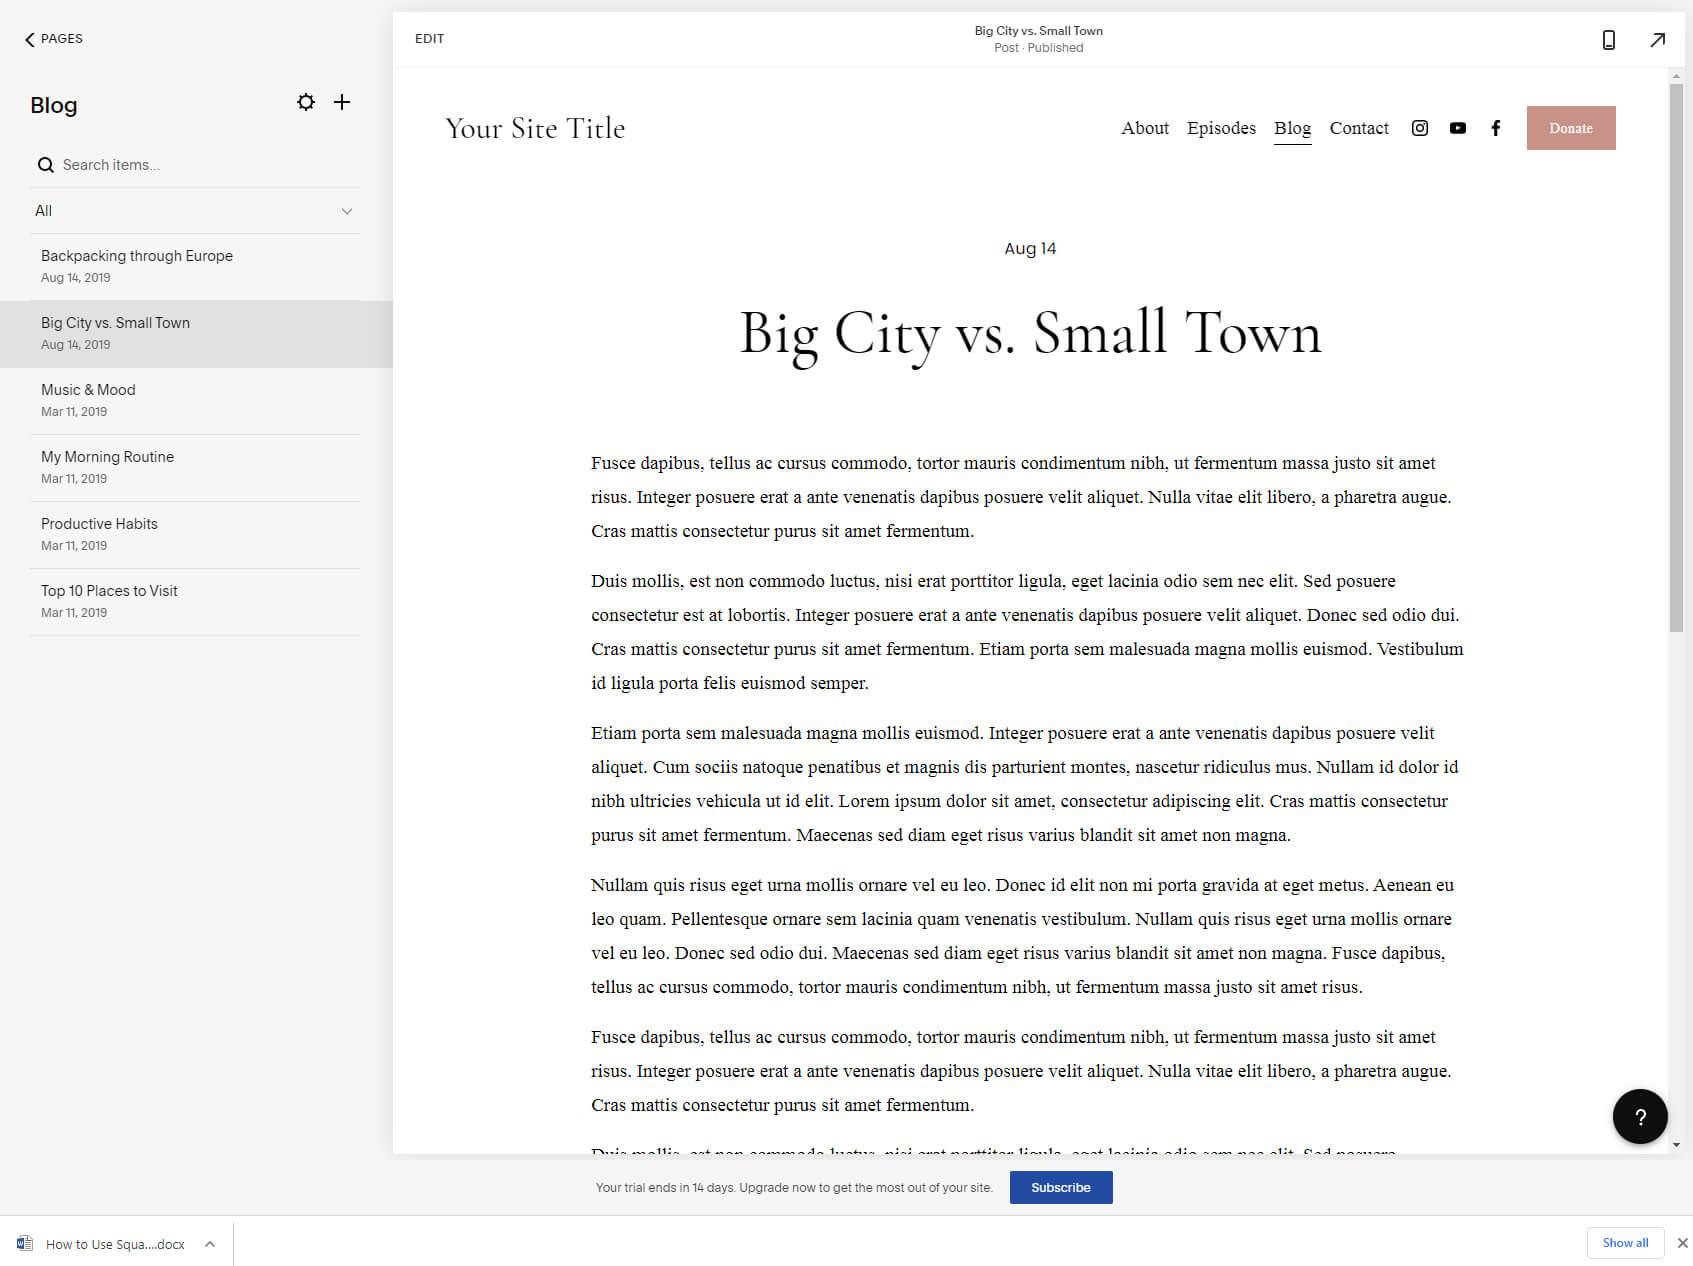 Squarespace blog list